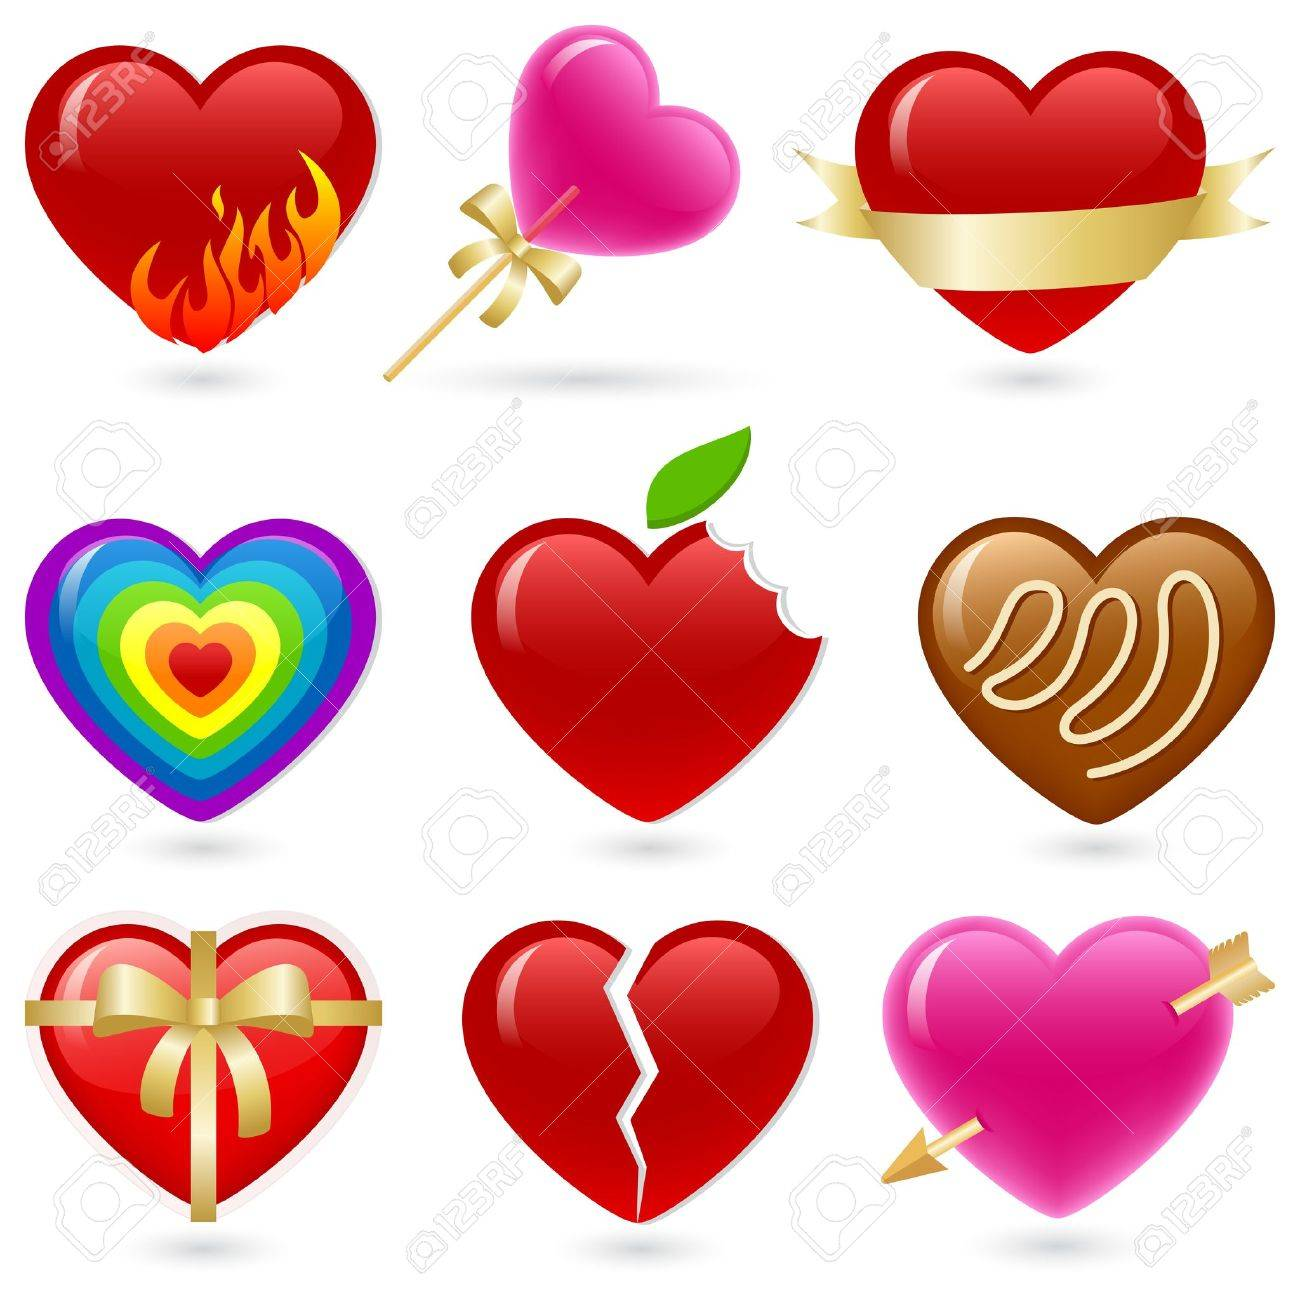 valentine u0027s heart shaped icon set royalty free cliparts vectors